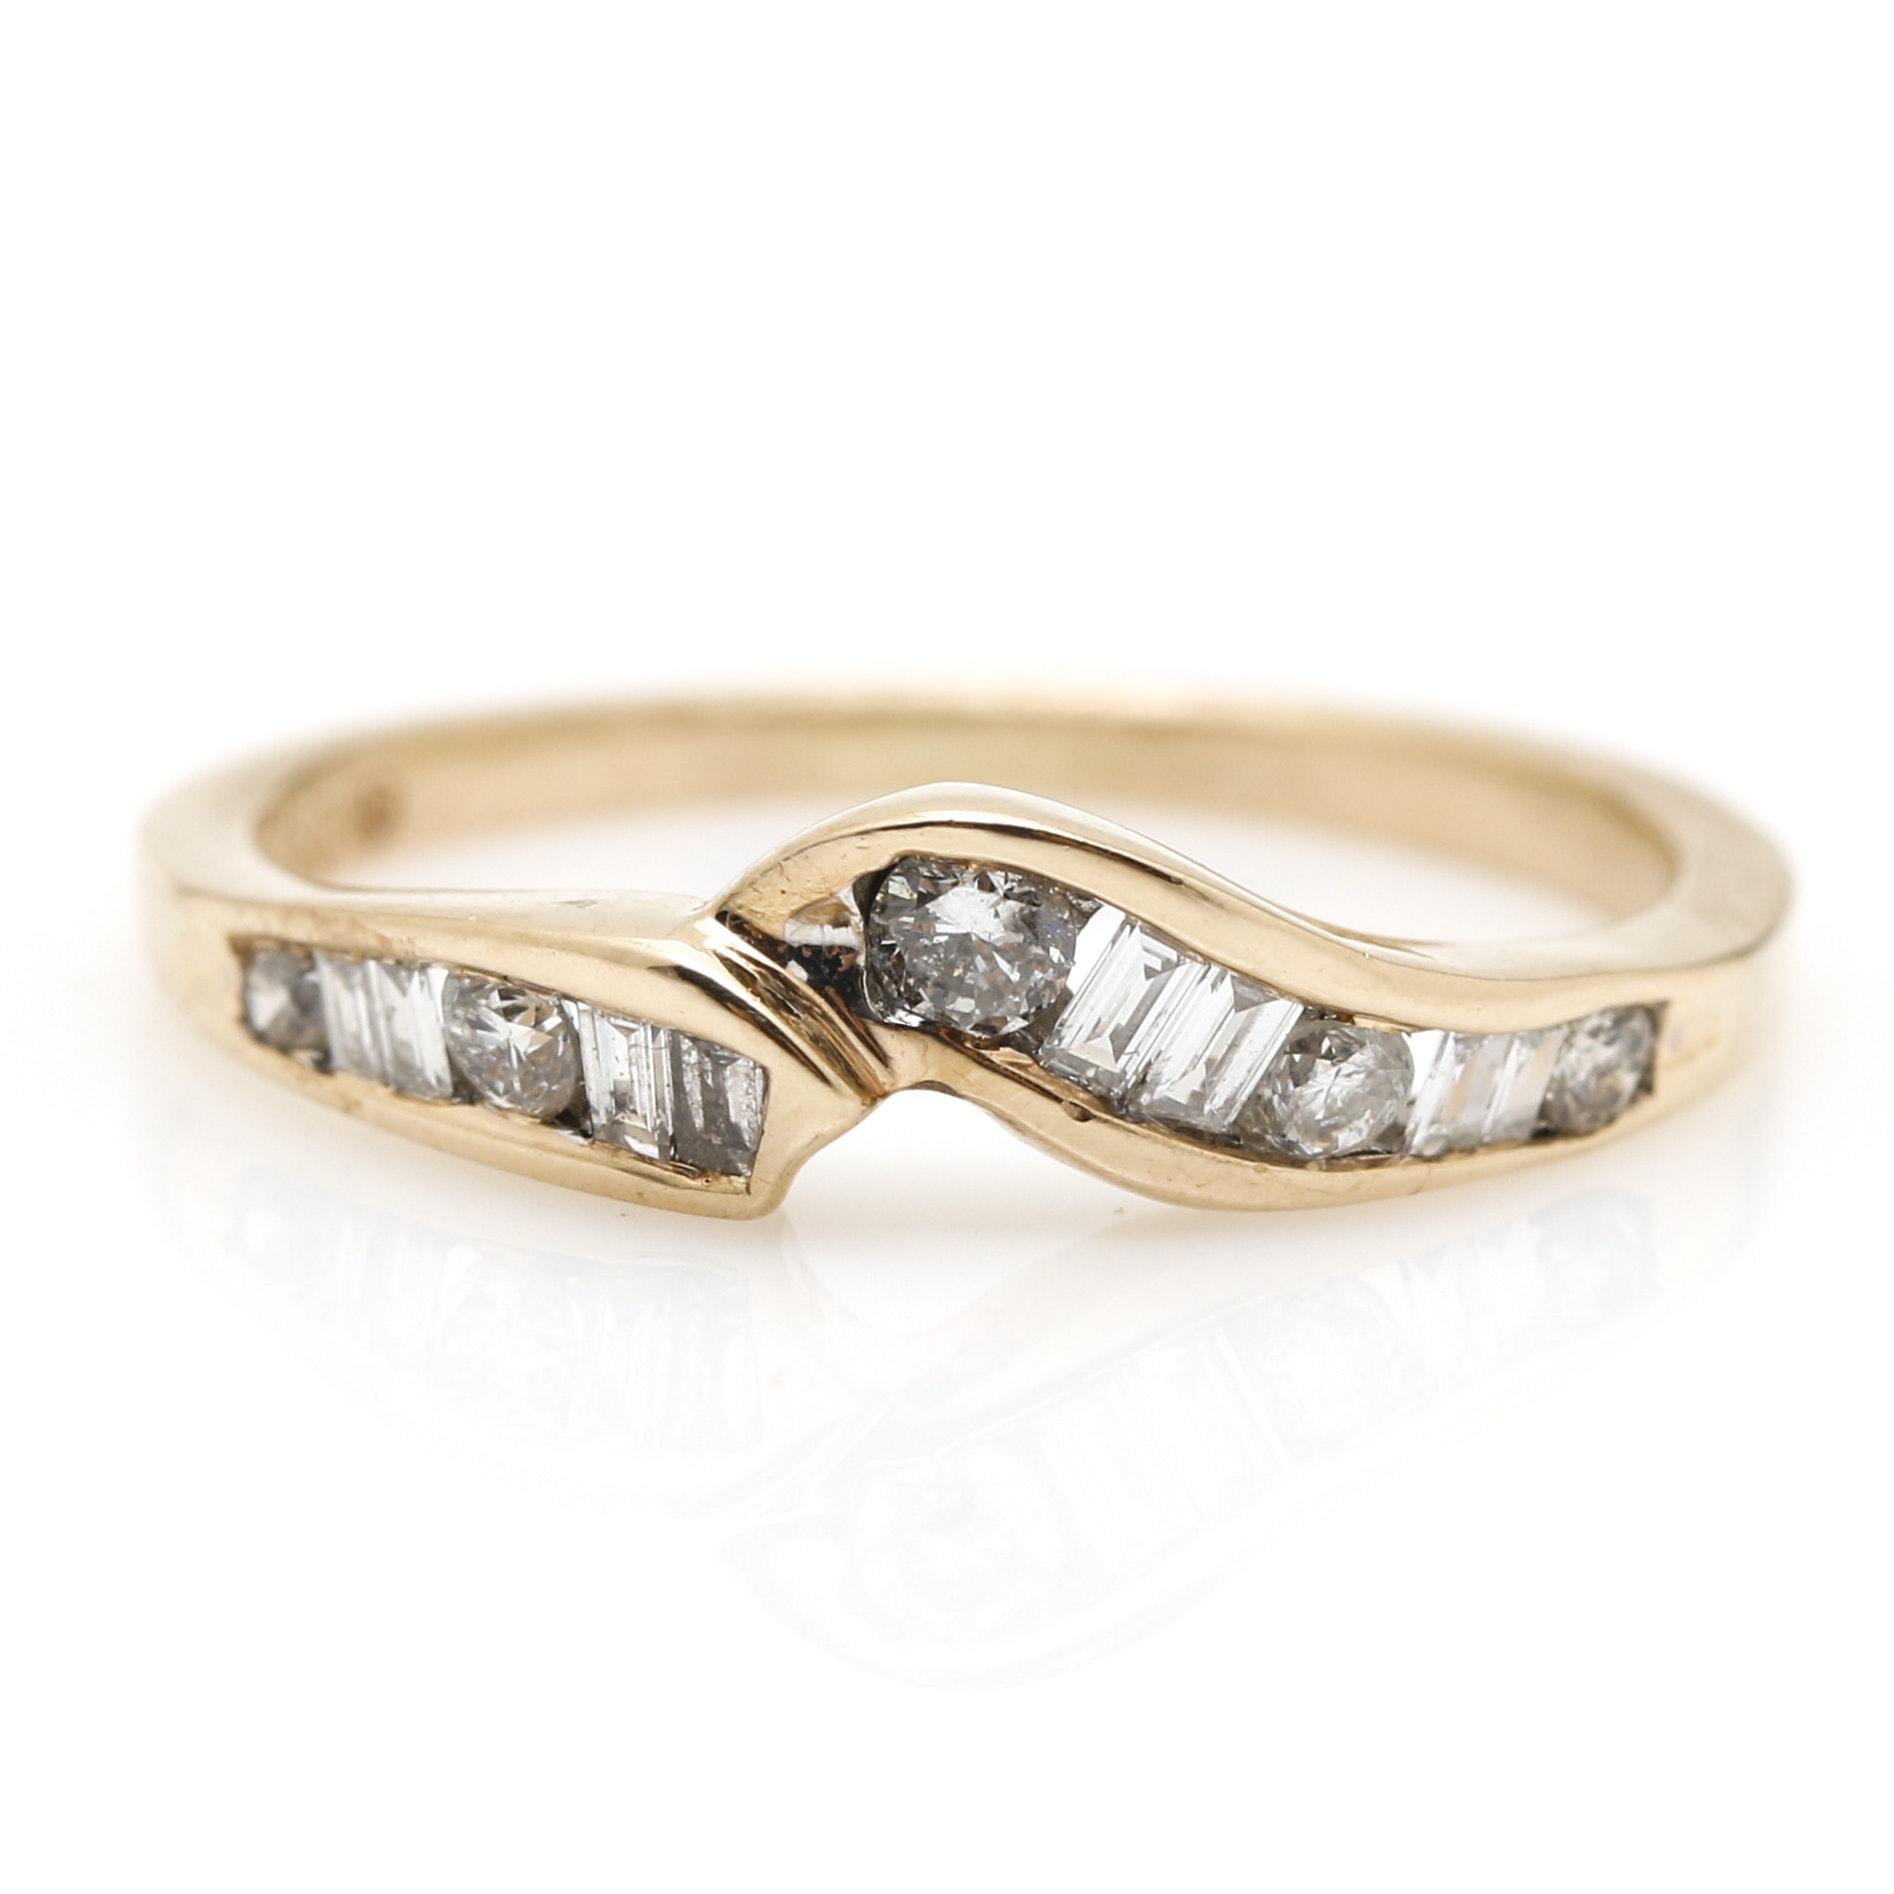 14K Yellow Gold Delicate 0.35 CTW Diamond Ring